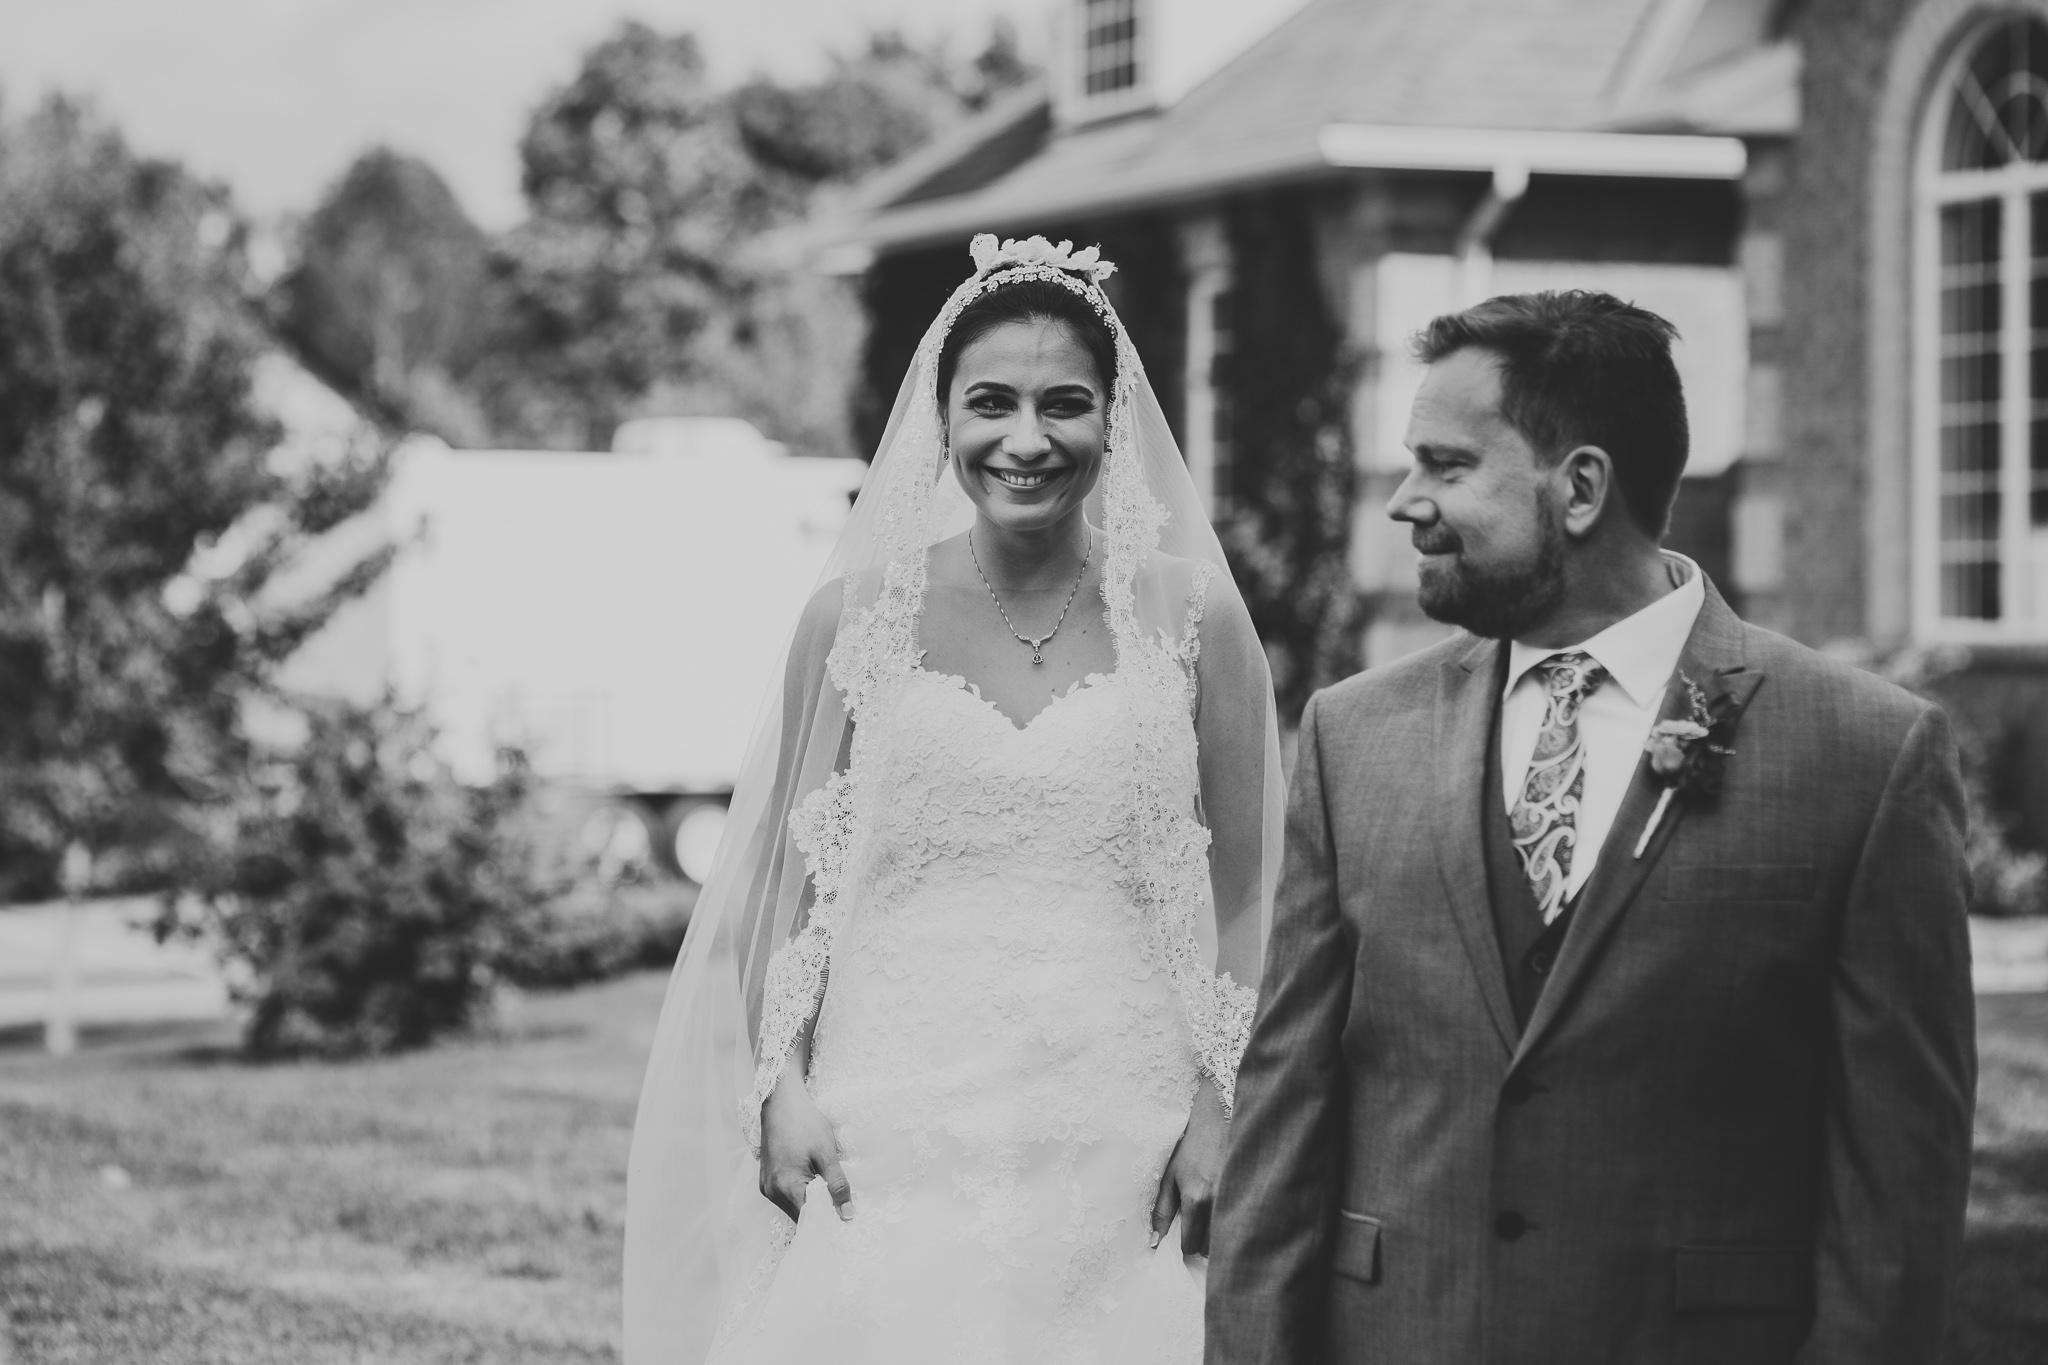 First-look wedding